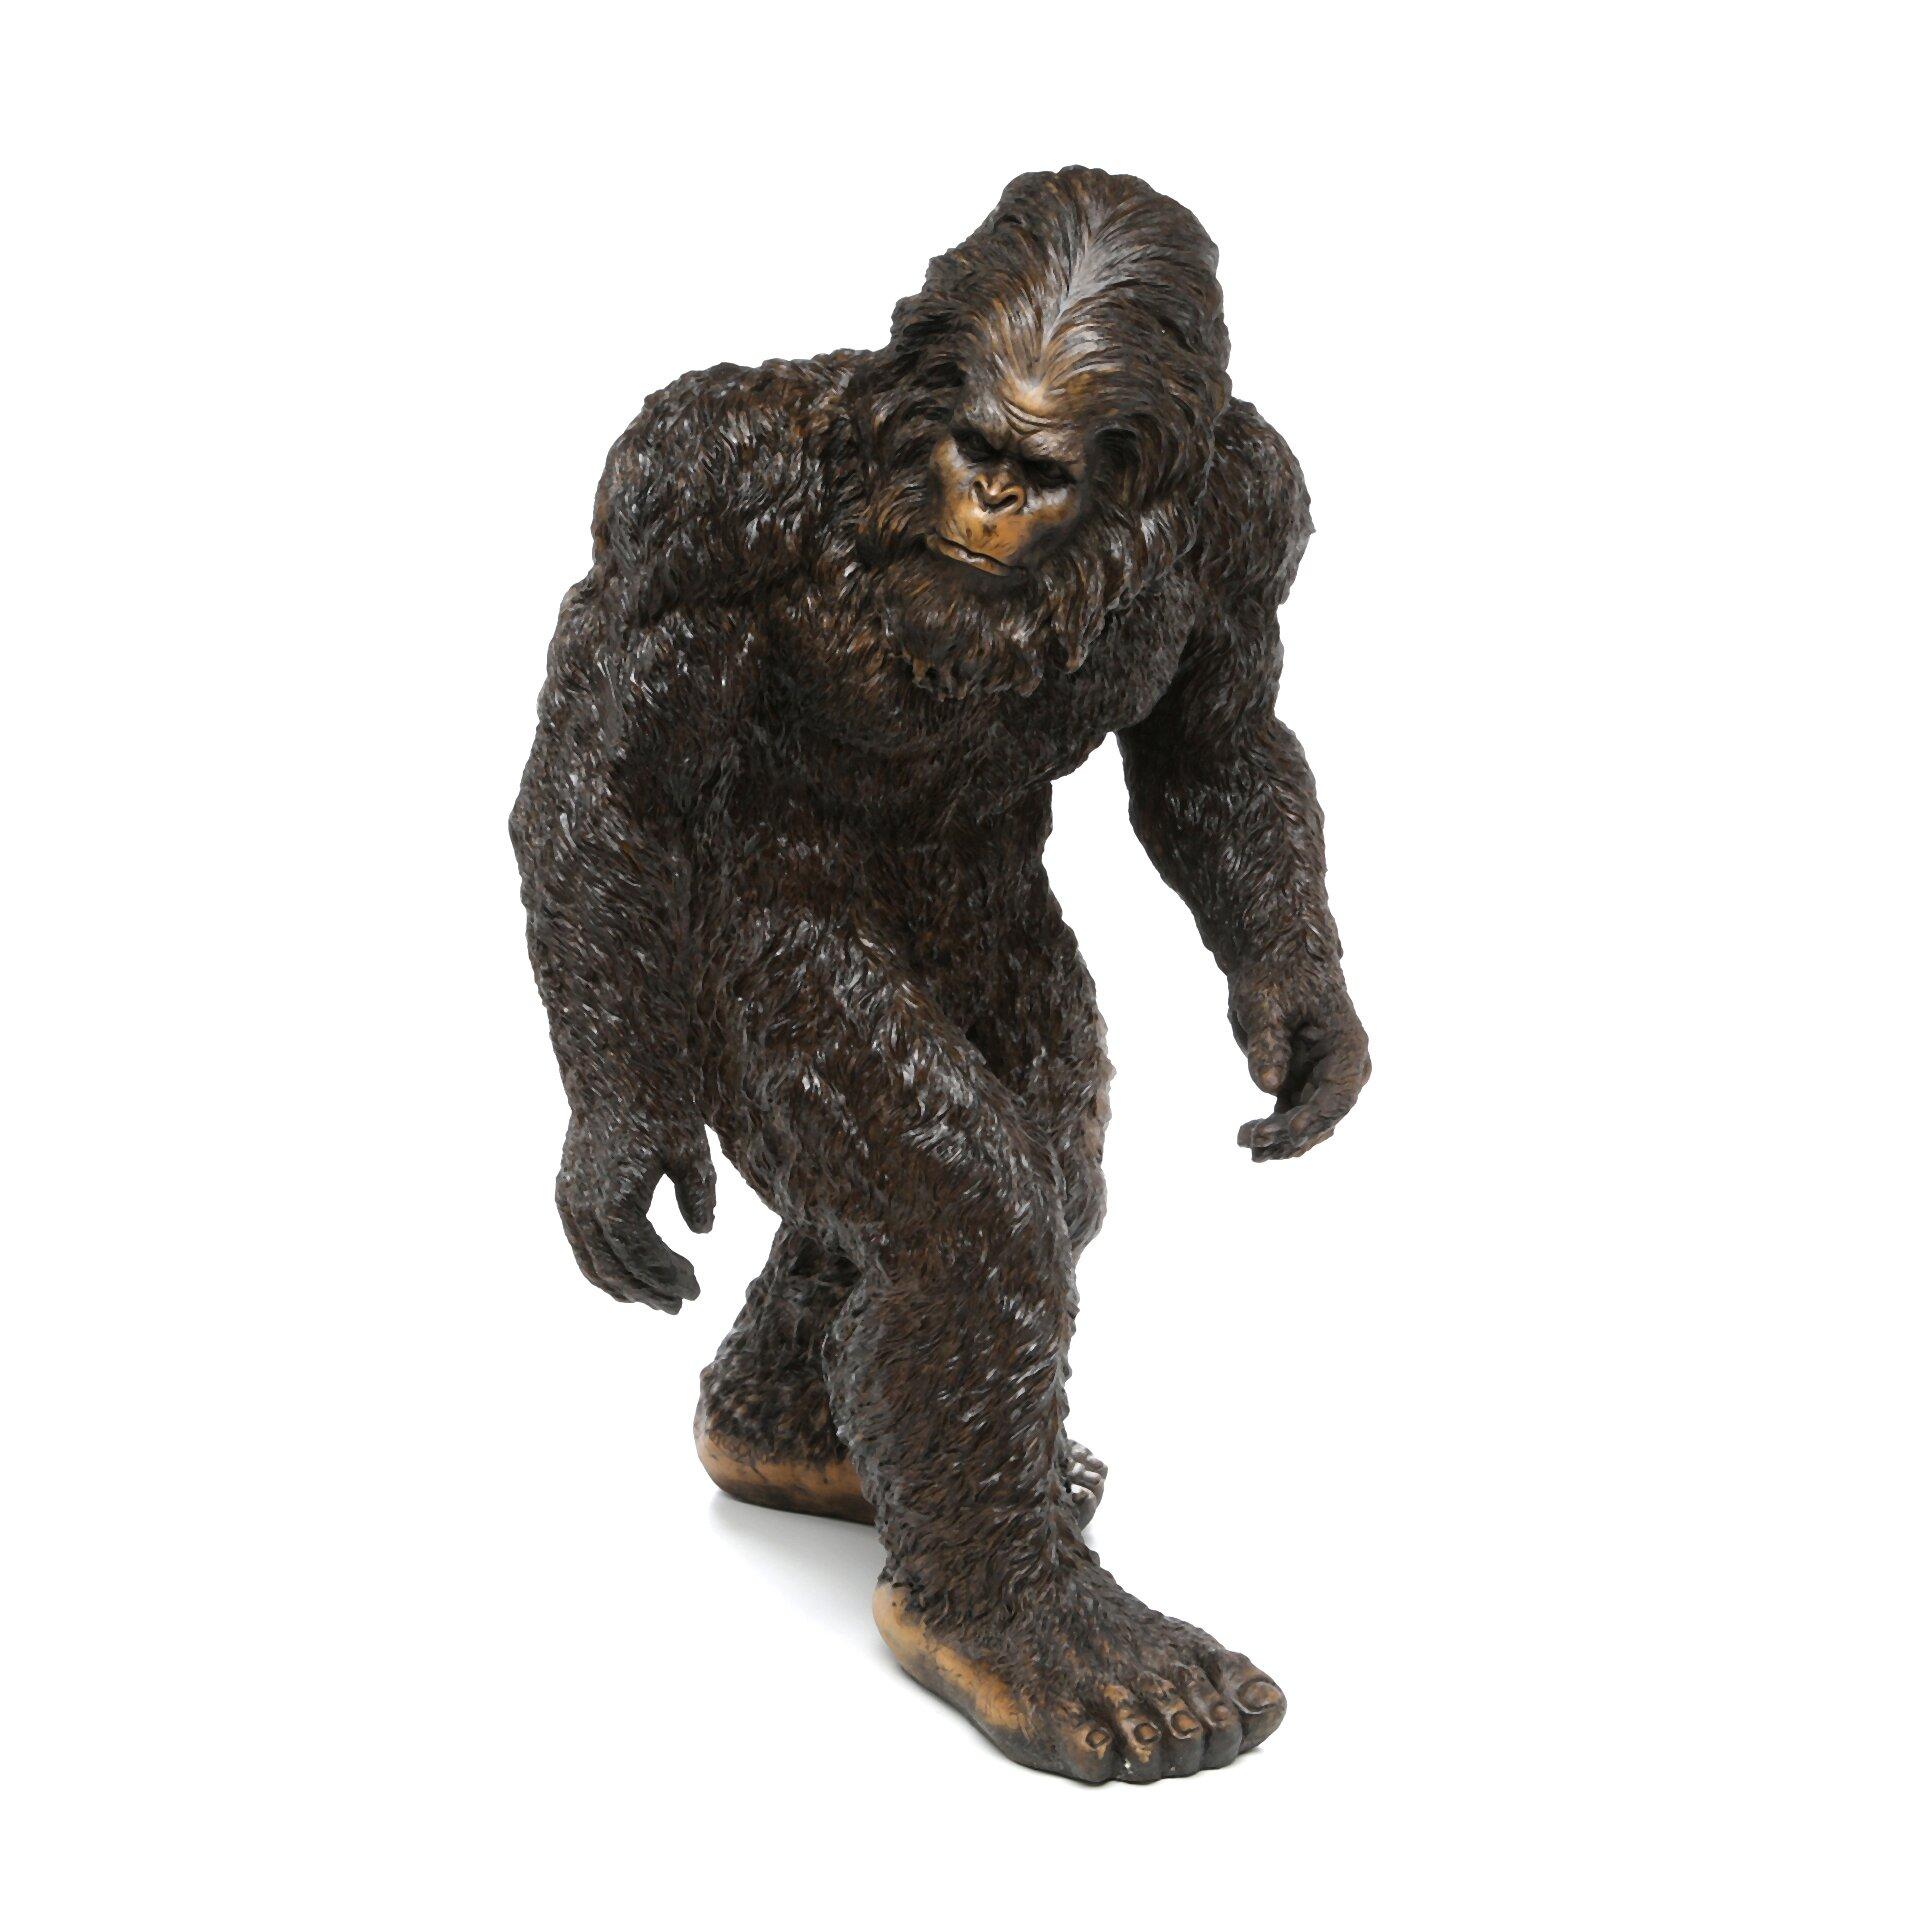 Bigfoot lawn ornament - Bigfoot Lawn Ornament 23